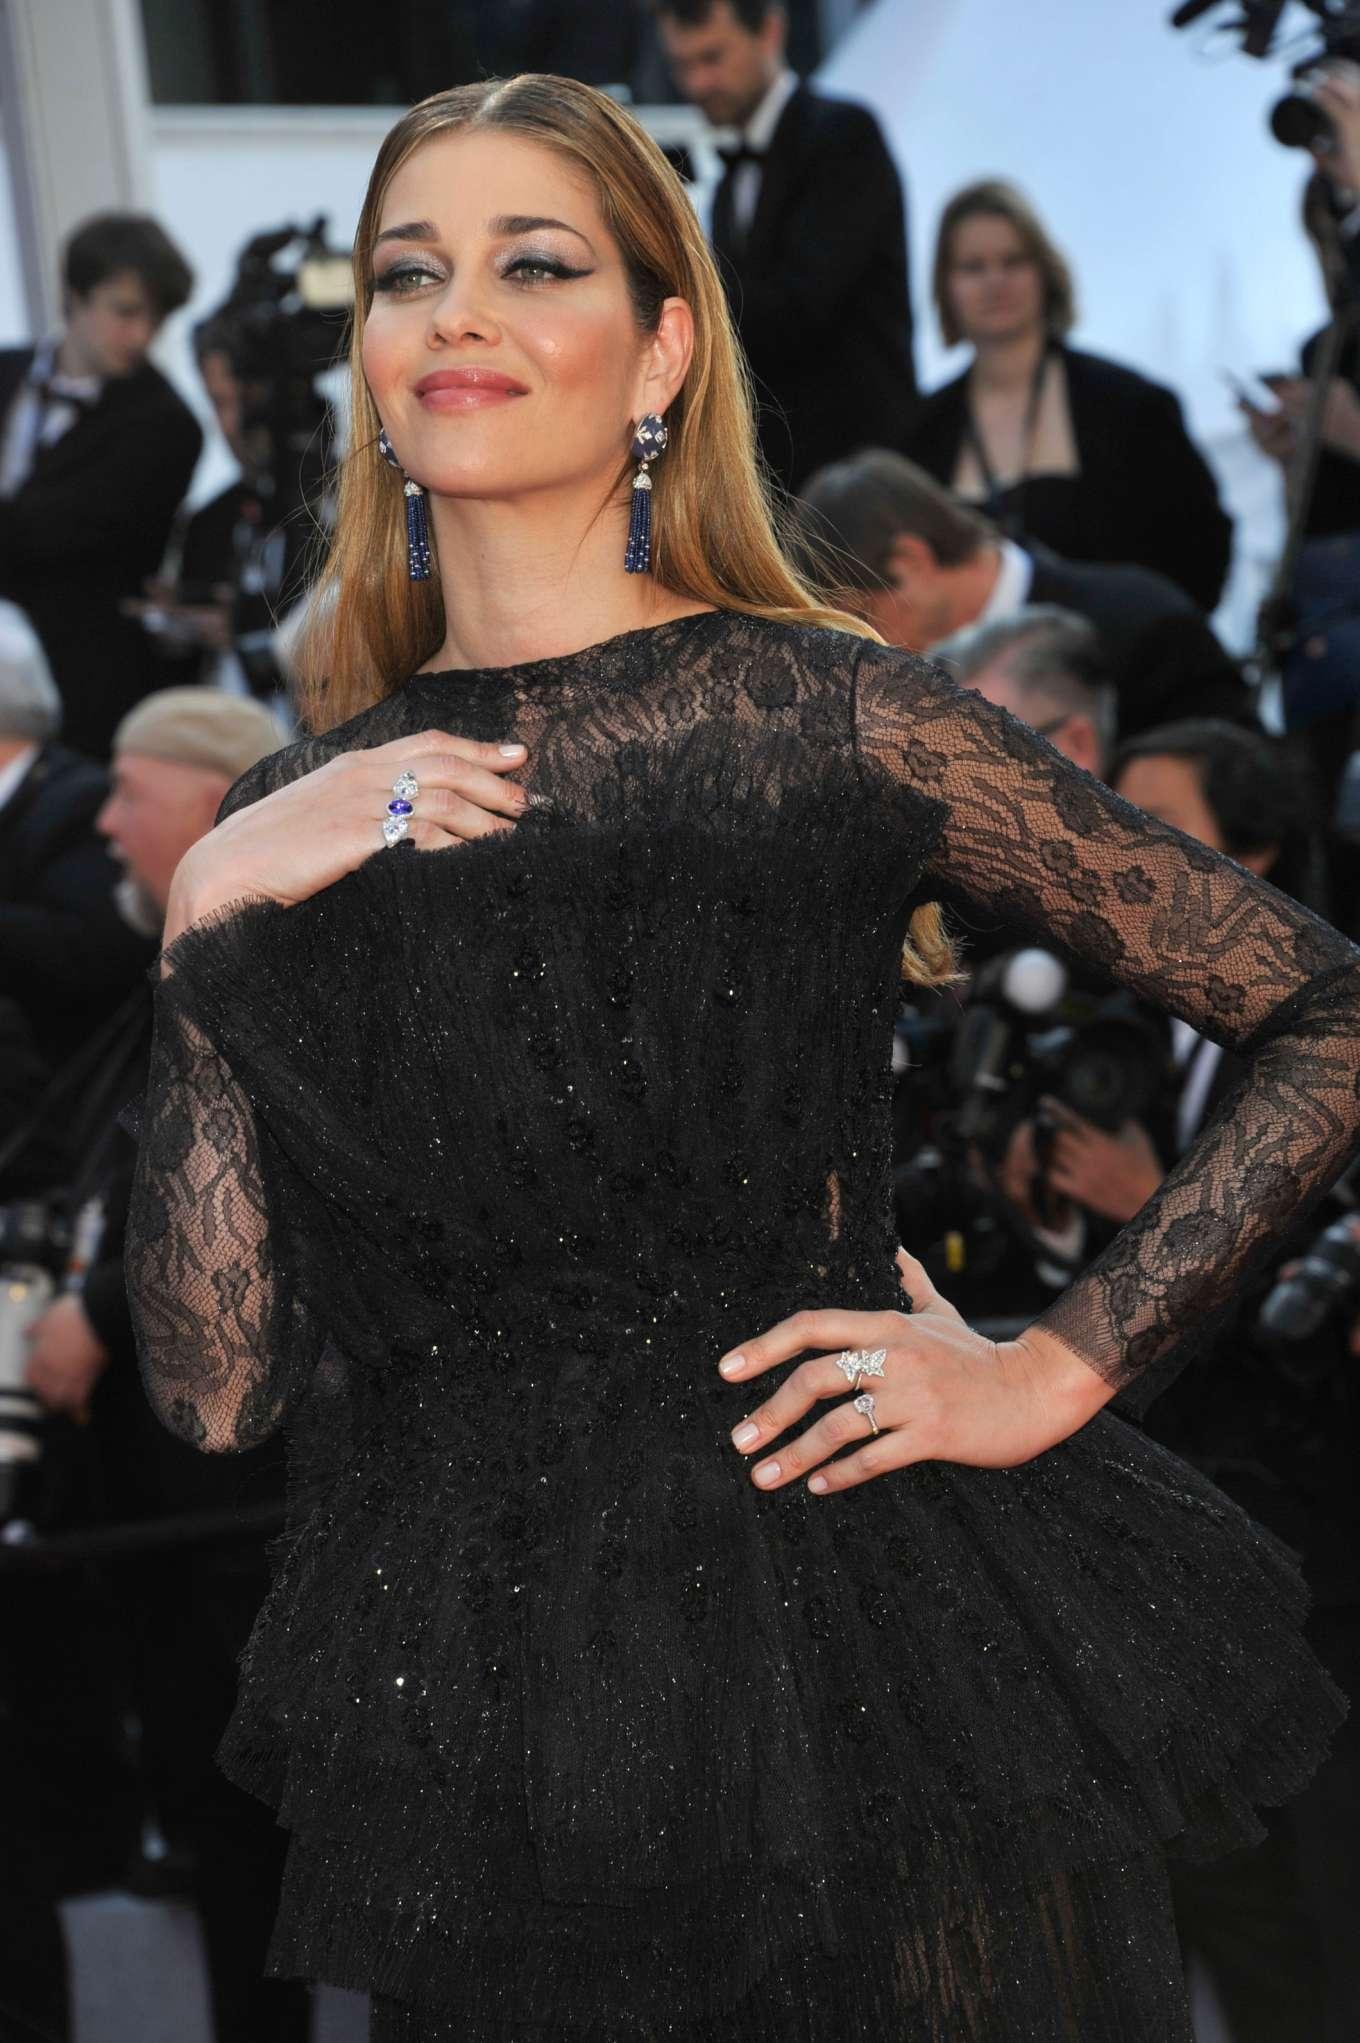 Ana Beatriz Barros 2019 : Ana Beatriz Barros: The Traitor Premiere at 2019 Cannes Film Festival-10